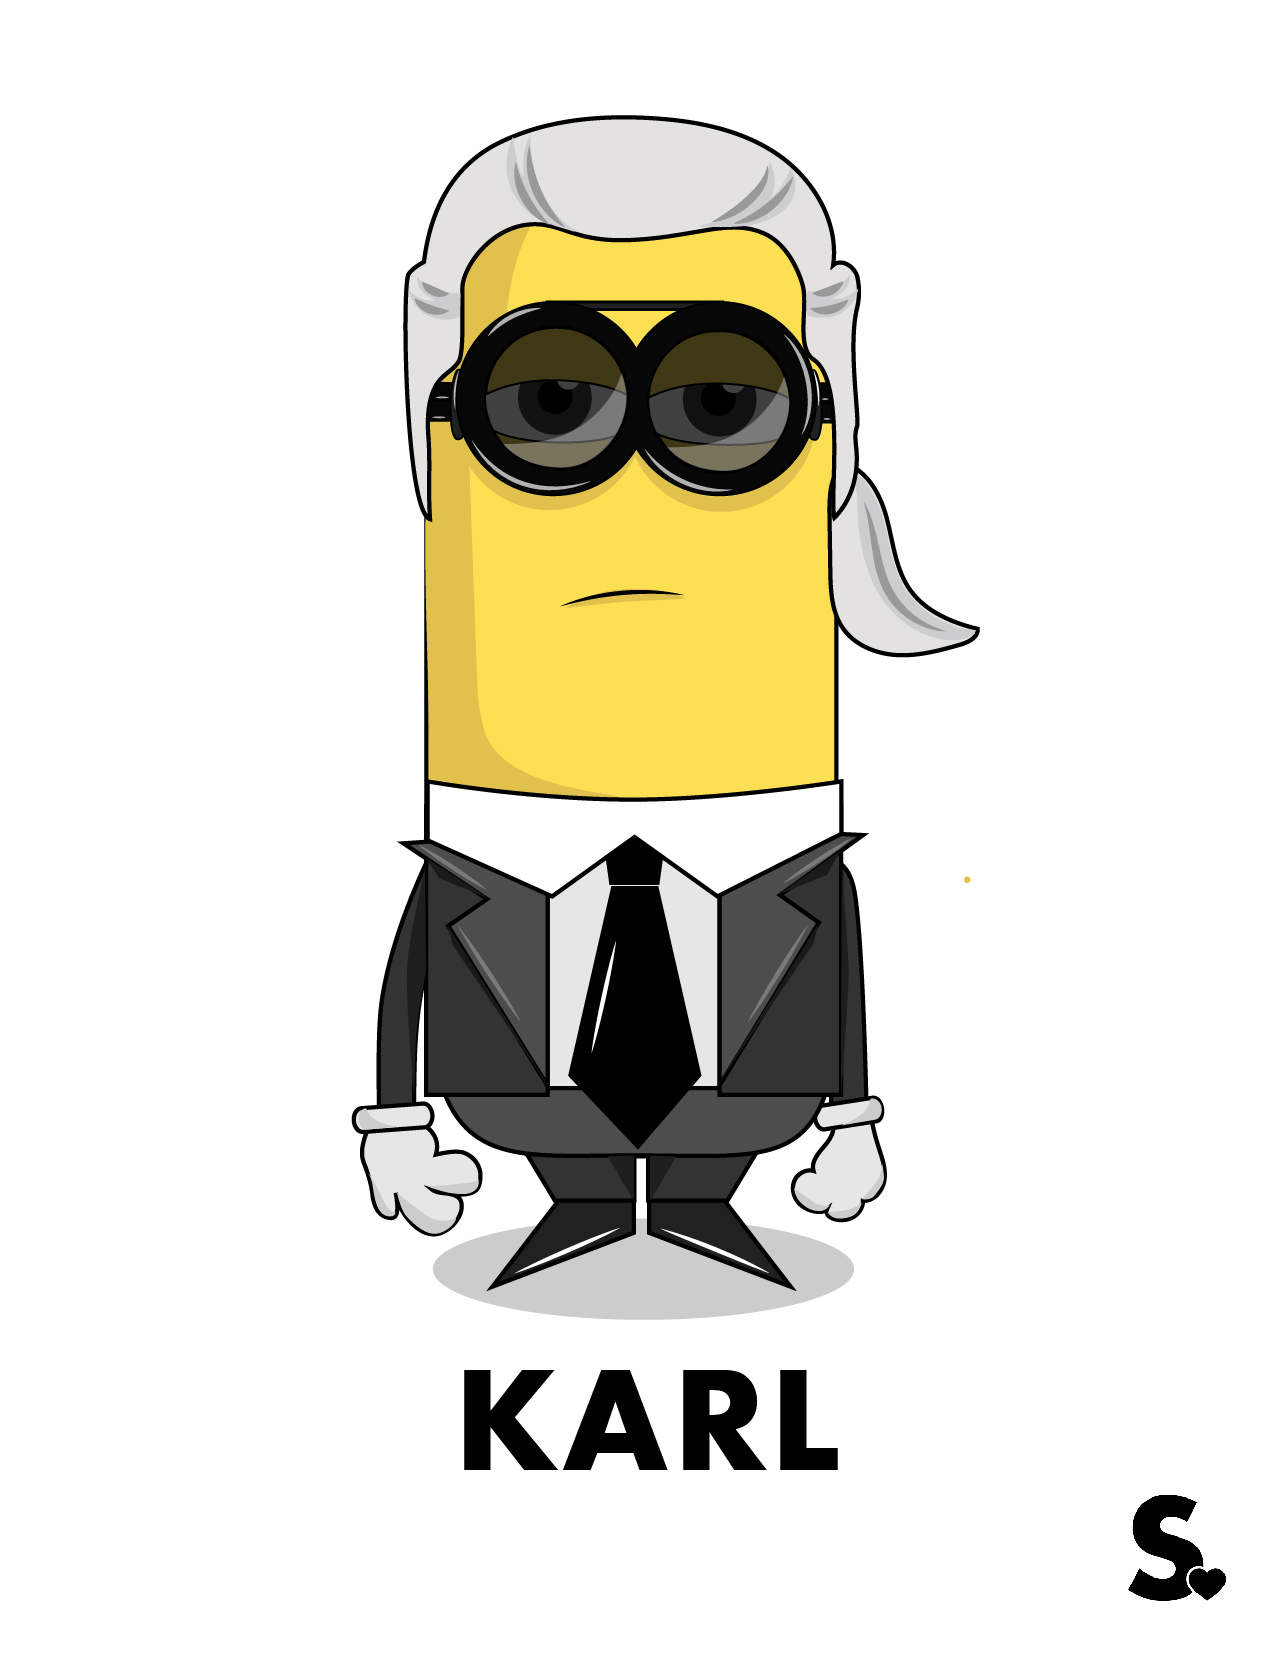 karl-minion